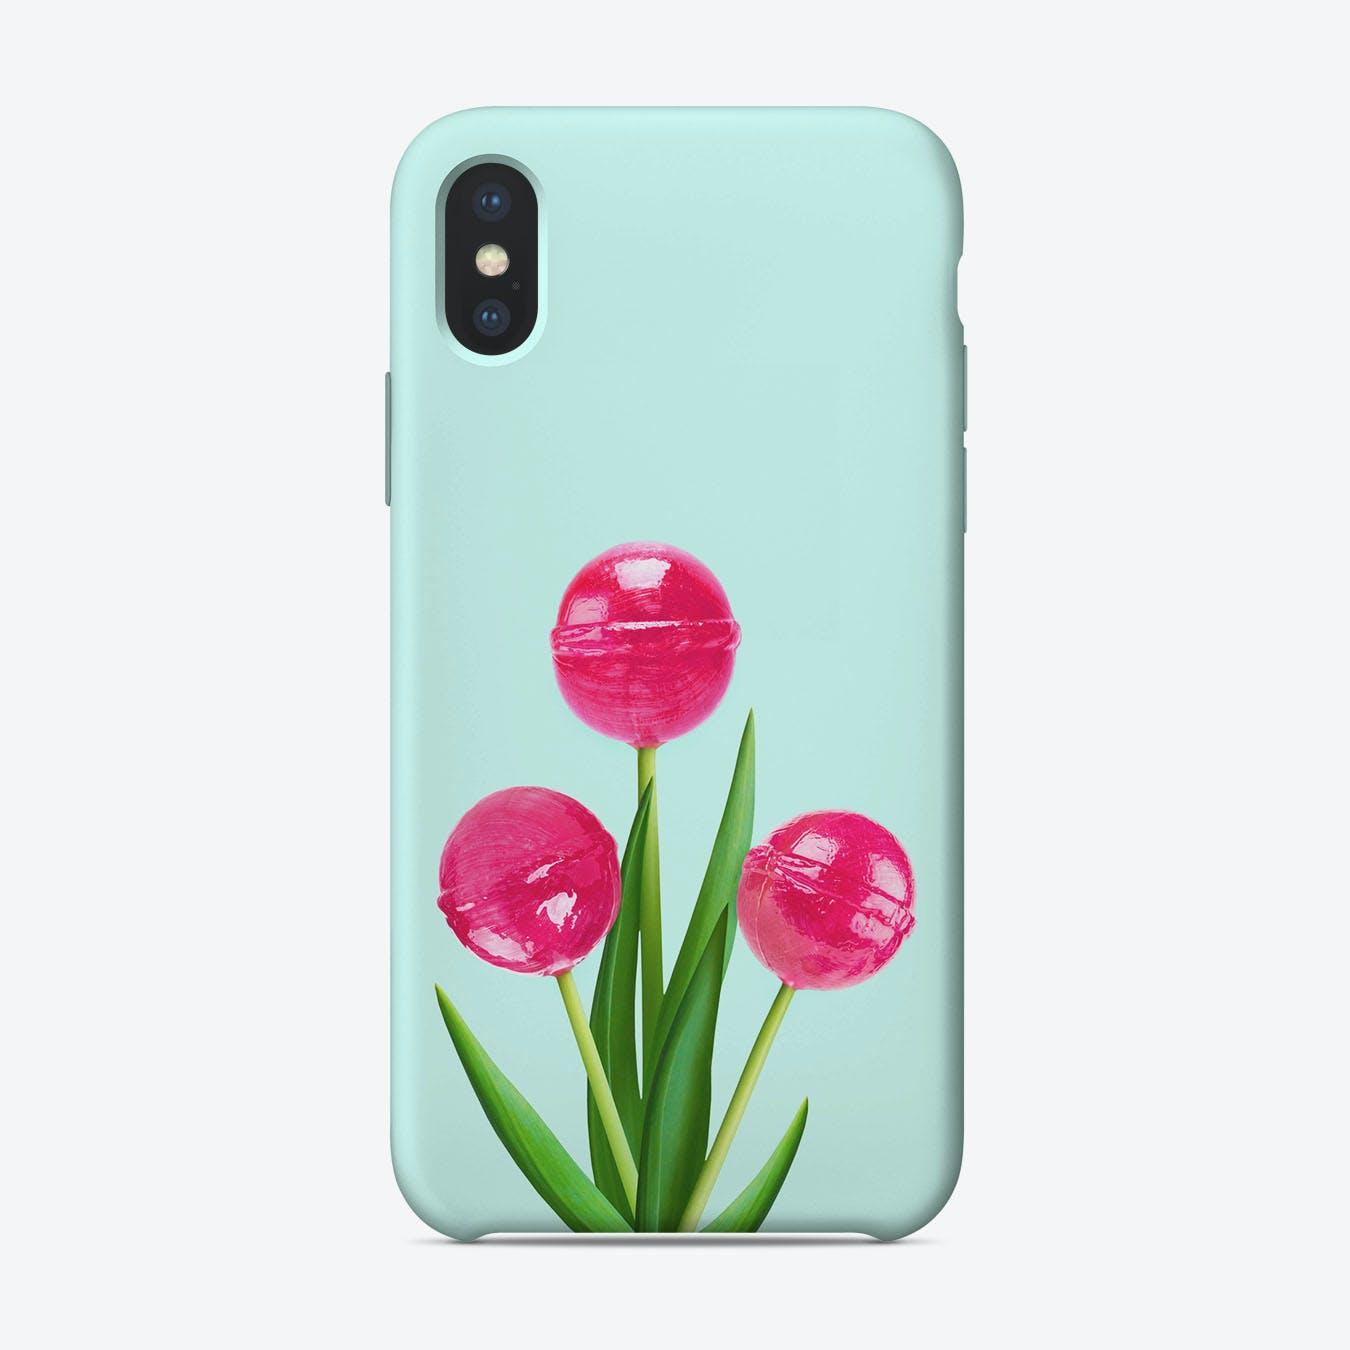 Lollipop Tulips iPhone Case